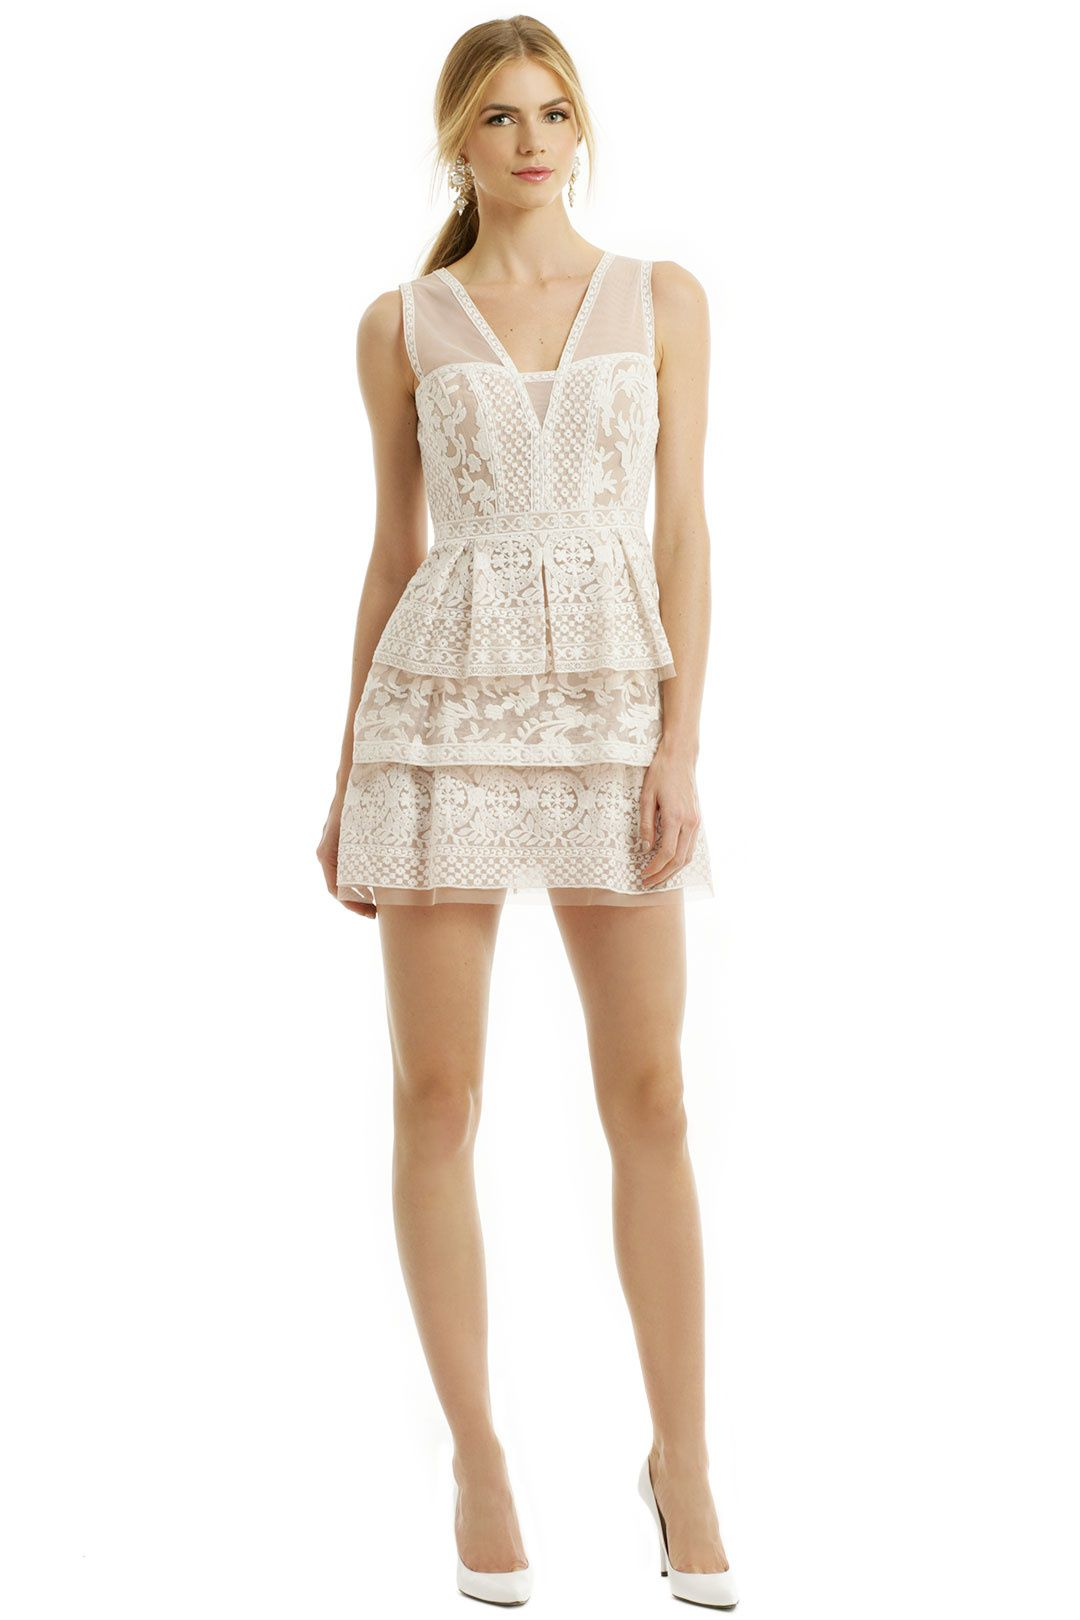 aab9d977ab Scarletta Lace Dress by BCBGMAXAZRIA for  60